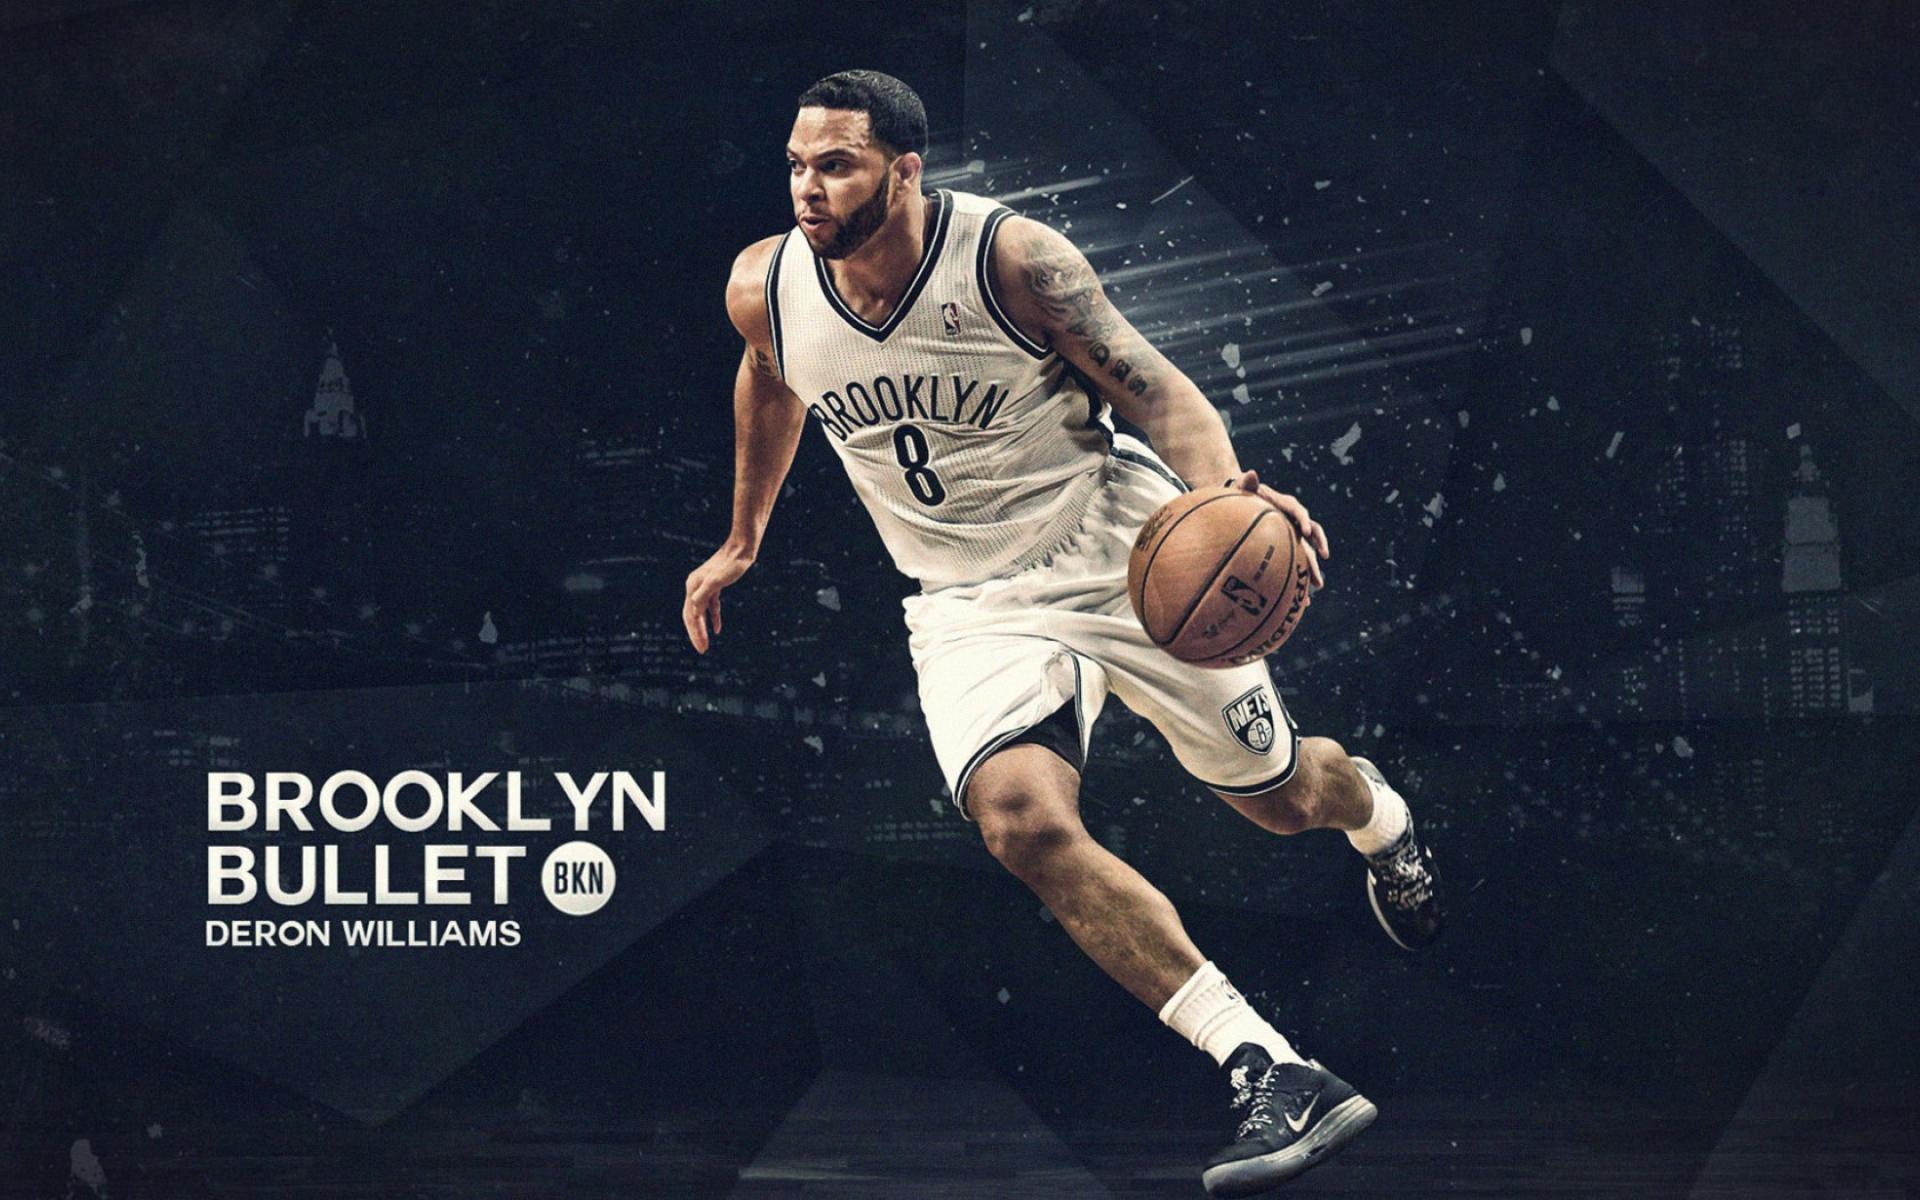 Картинки Deron williams, brooklyn, point guard, баскетбол, игрок, защитник, спорт, мяч фото и обои на рабочий стол